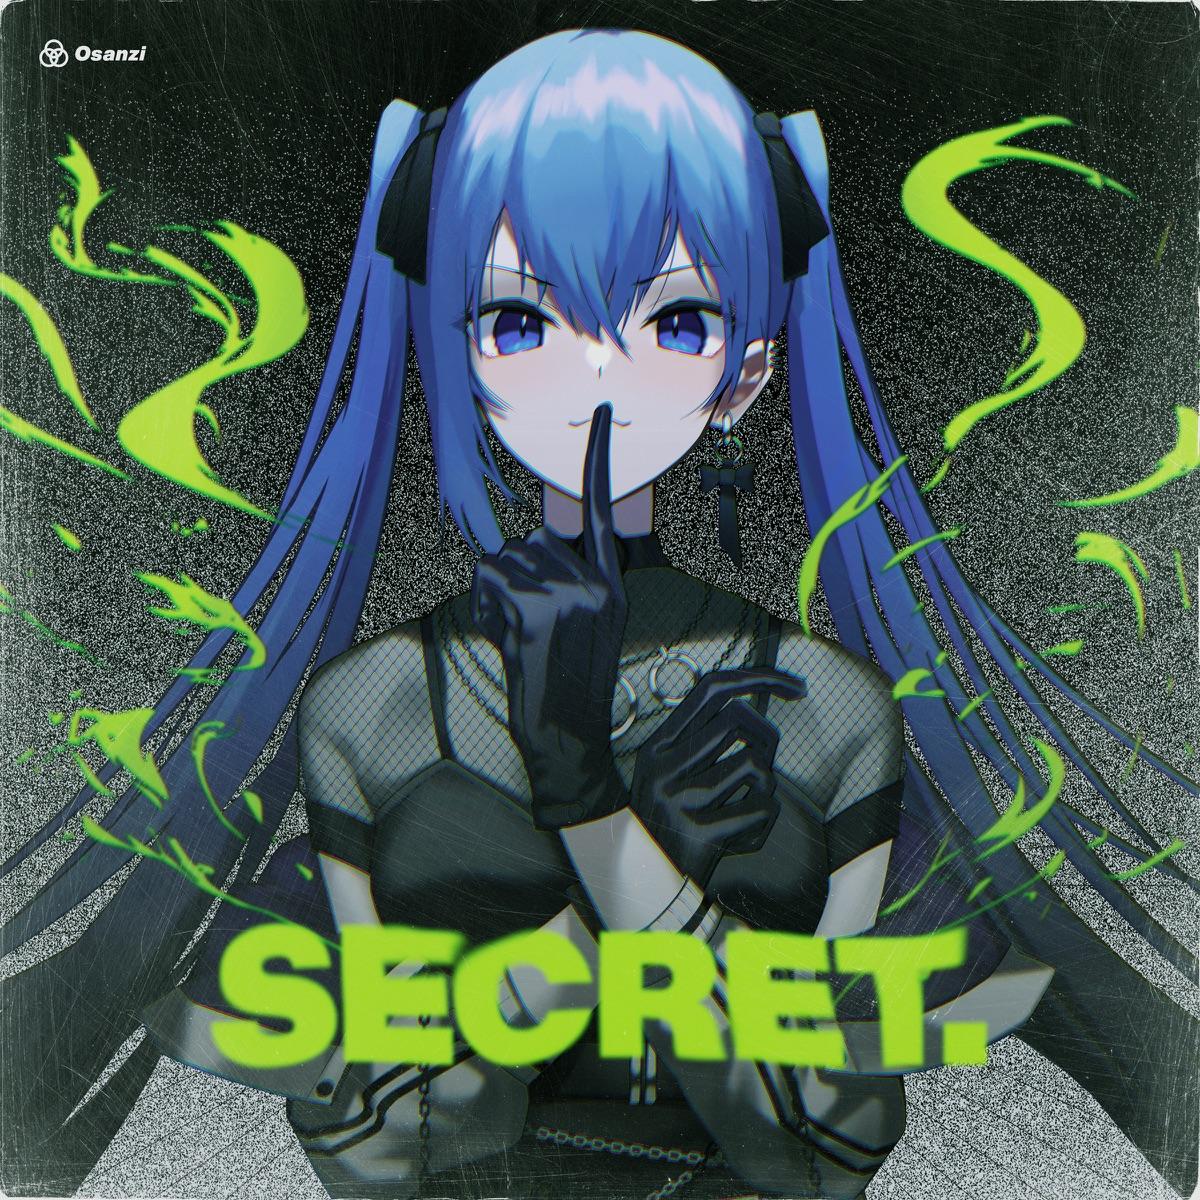 『Osanzi - Secret Lie 歌詞』収録の『SECRET.』ジャケット